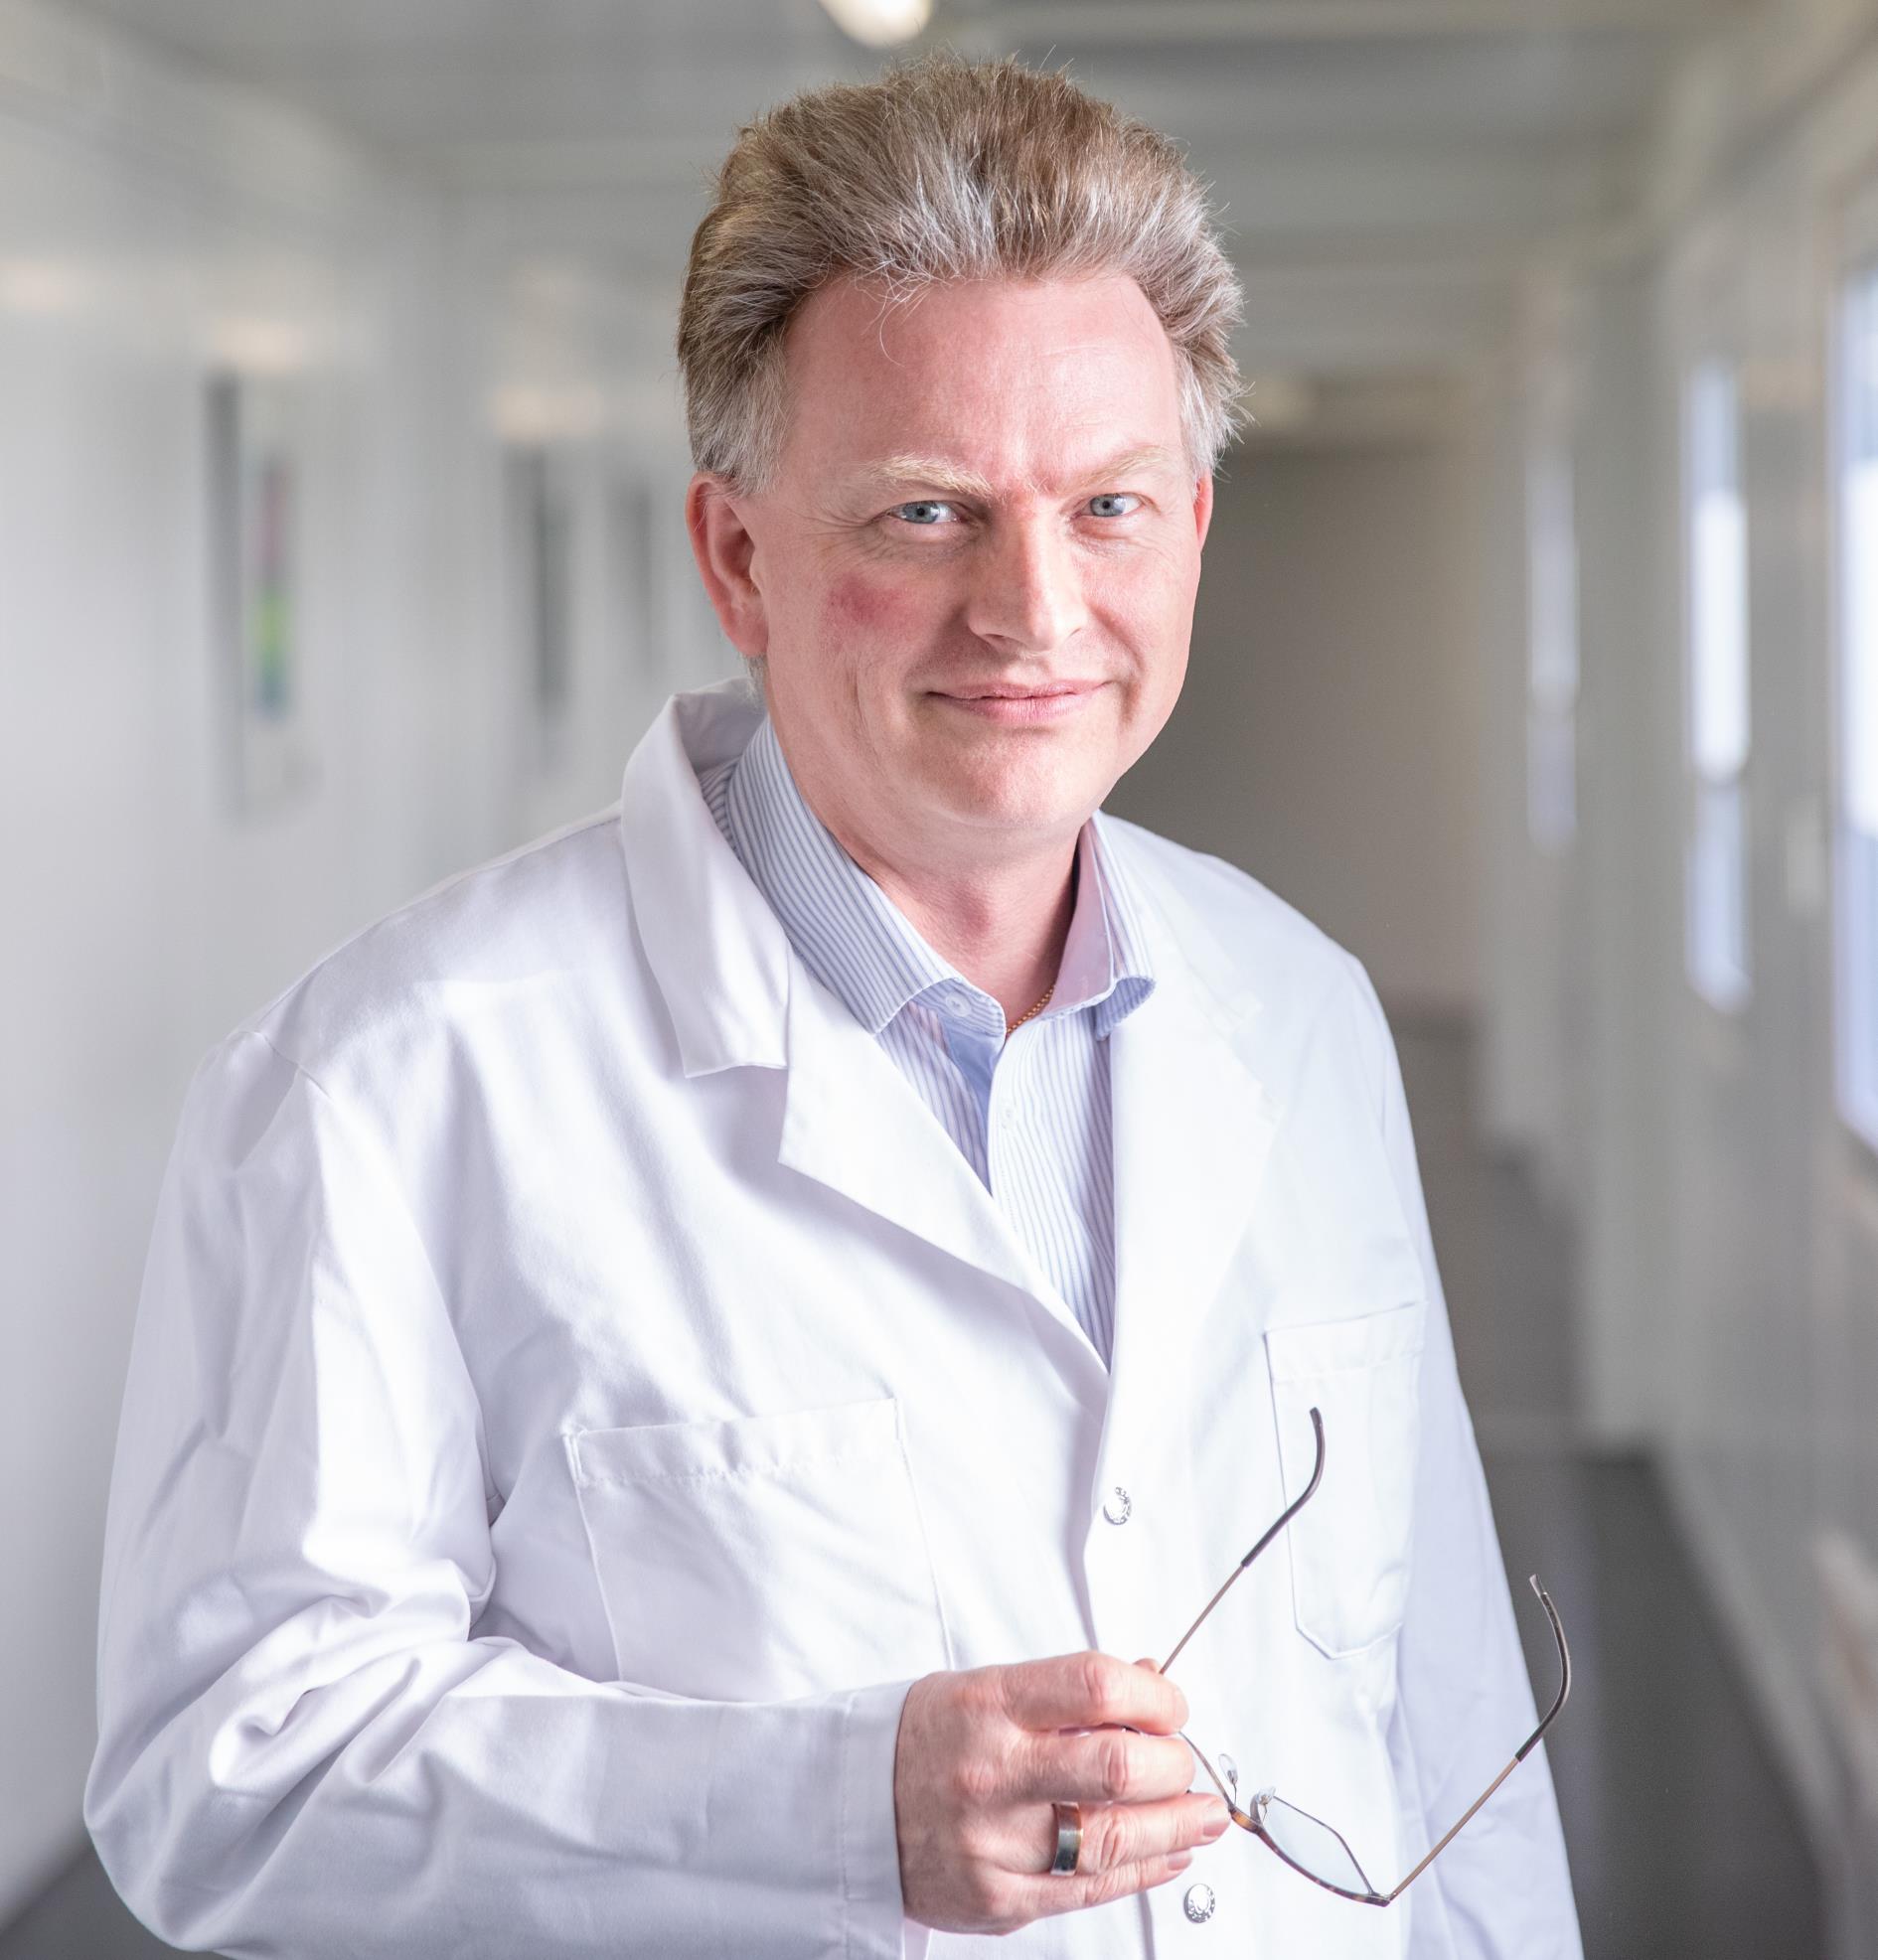 Dr Thomann